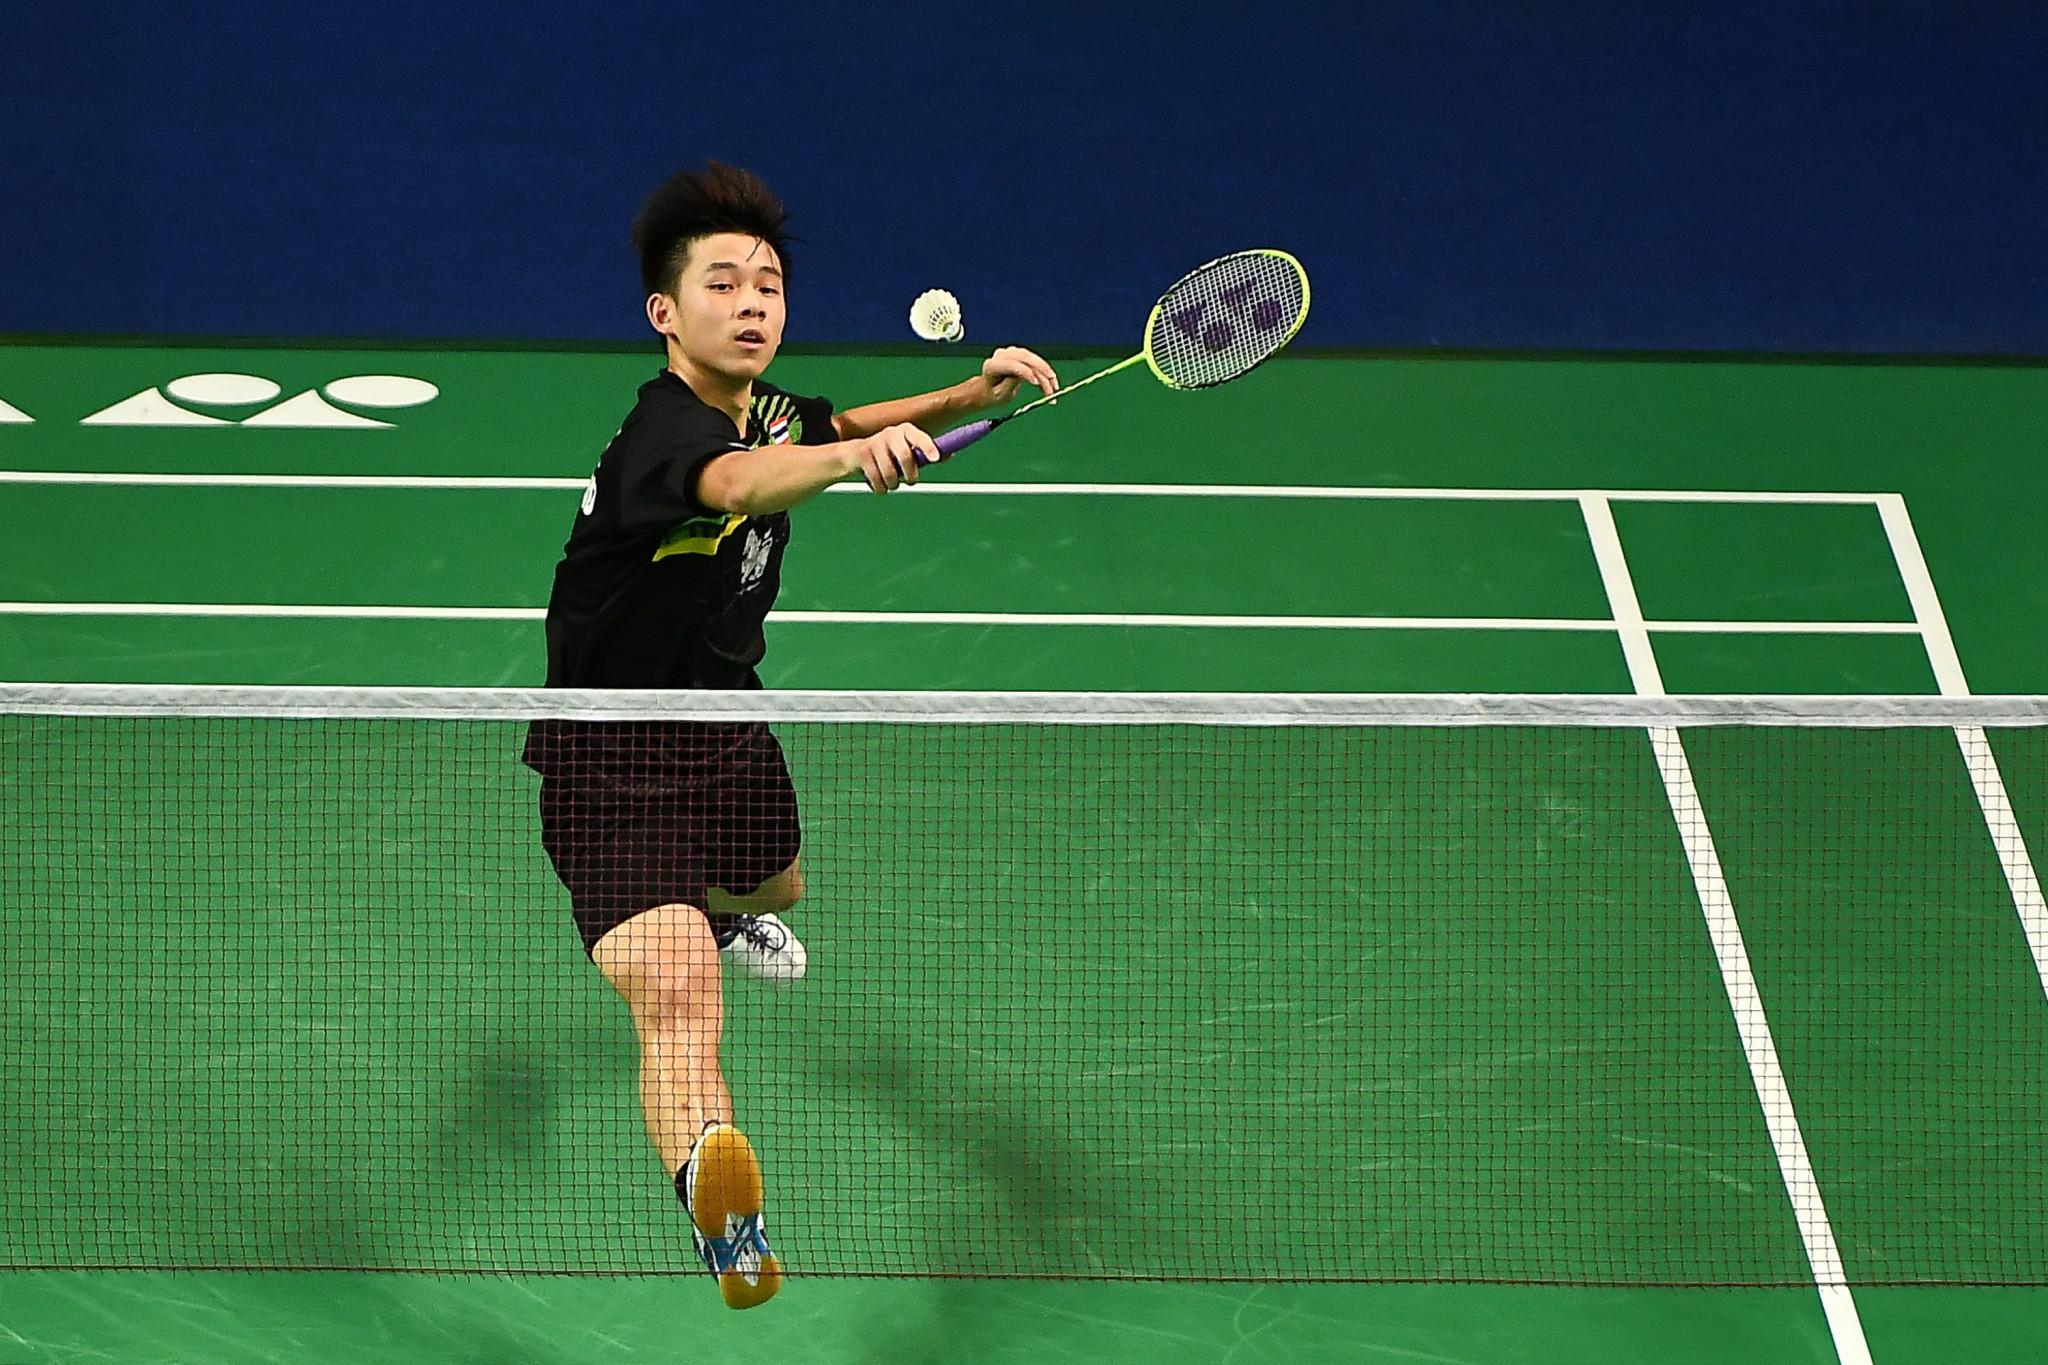 Thailand's Kunlavut Vitidsarn won the men's singles final ©Getty Images